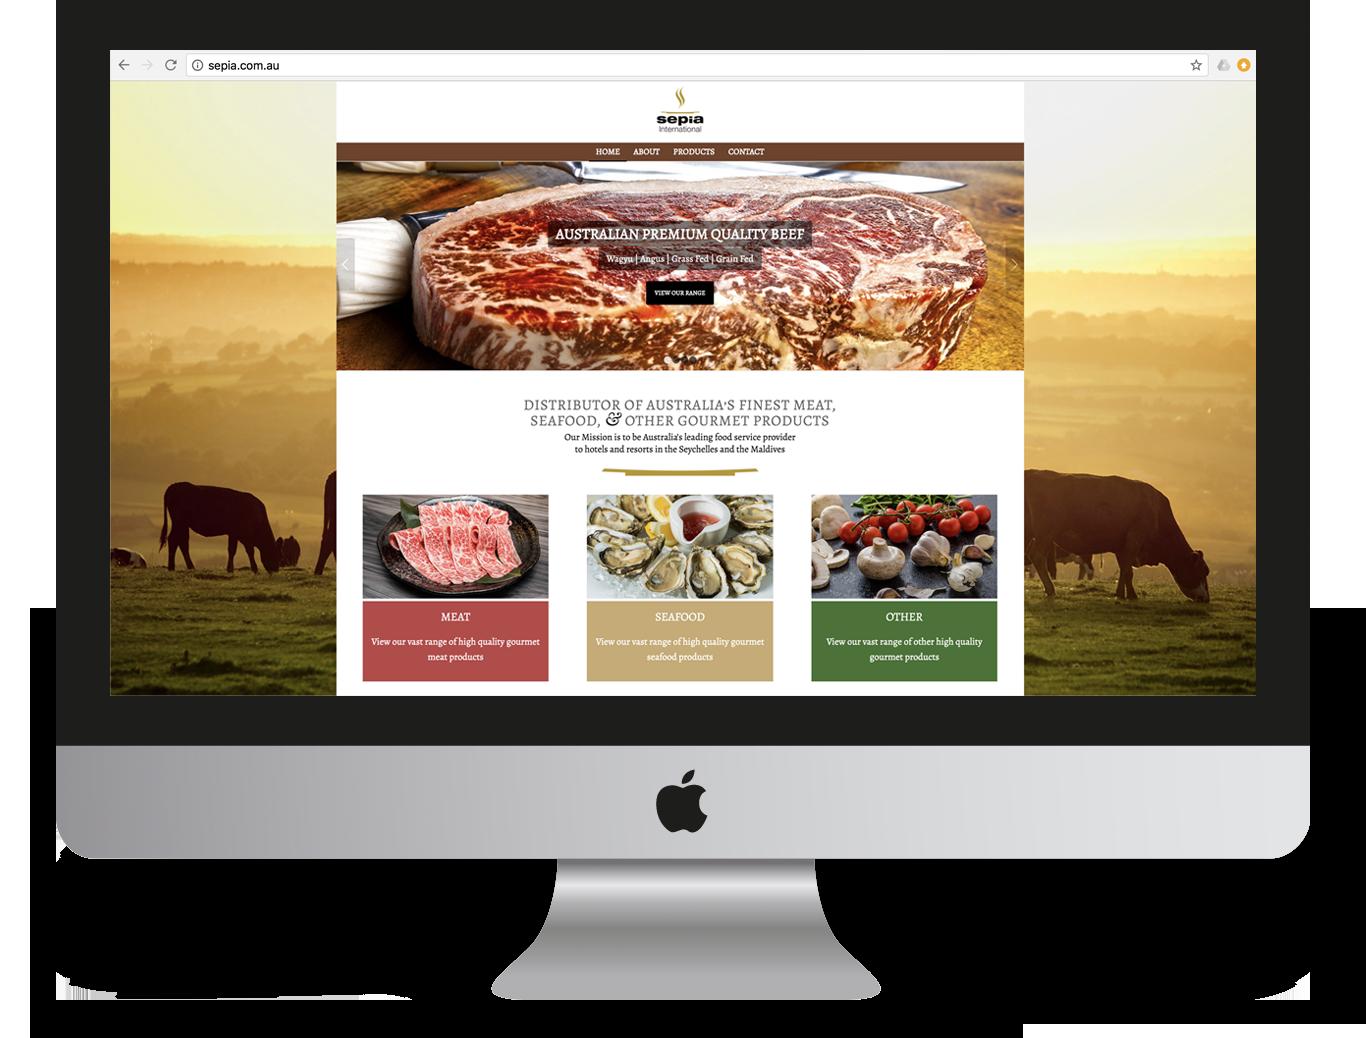 Sepia International Website Design and Development - Ignite Group Website Development - Miki Media   Melbourne Web Design Services